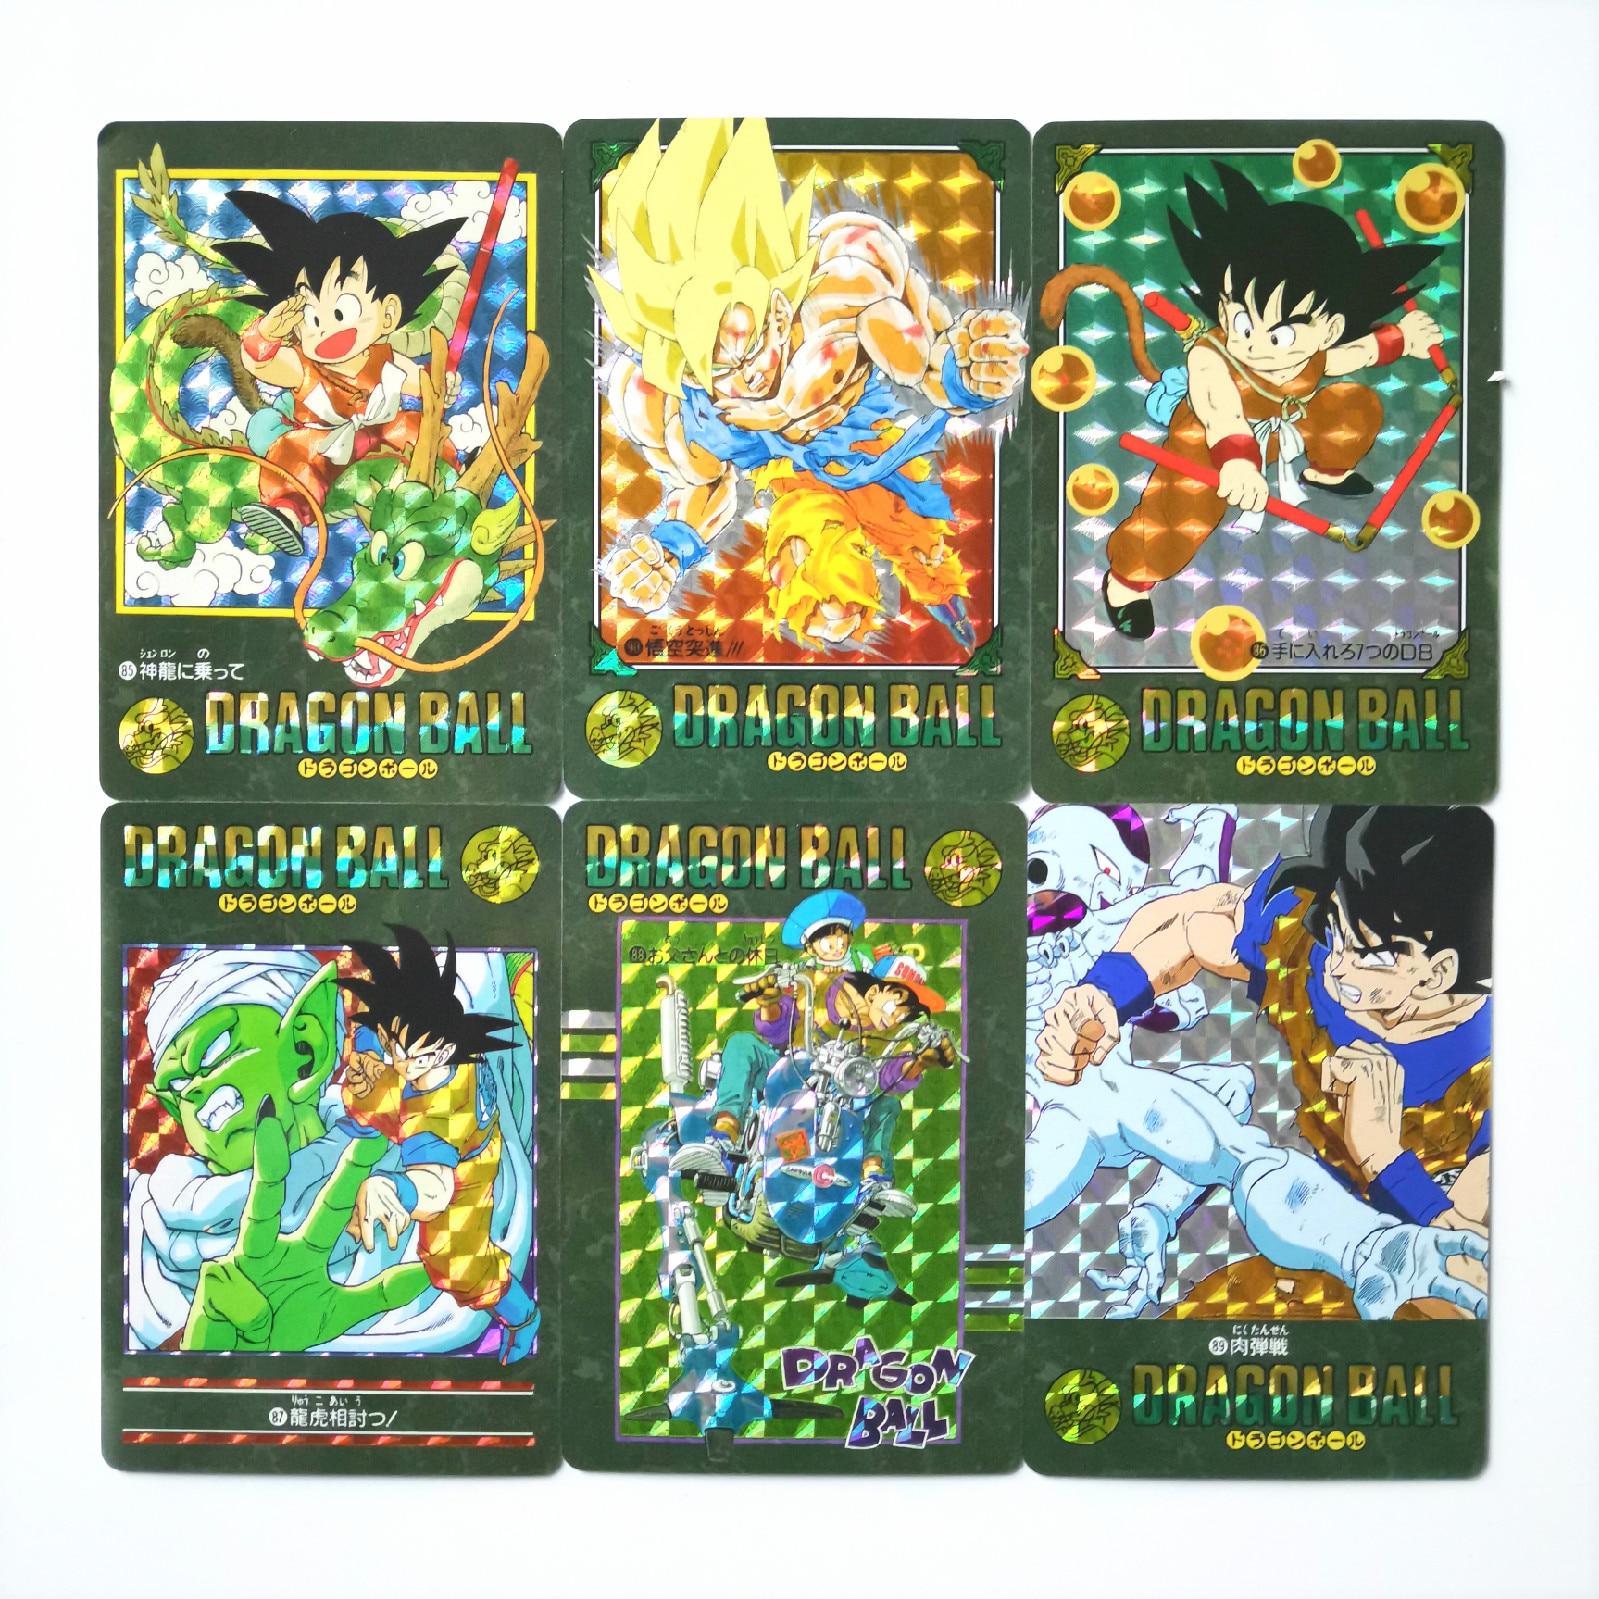 42pcs/set Super Dragon Ball Z Situation Reissue Third Bomb Heroes Battle Card Ultra Instinct Goku Vegeta Game Collection Cards